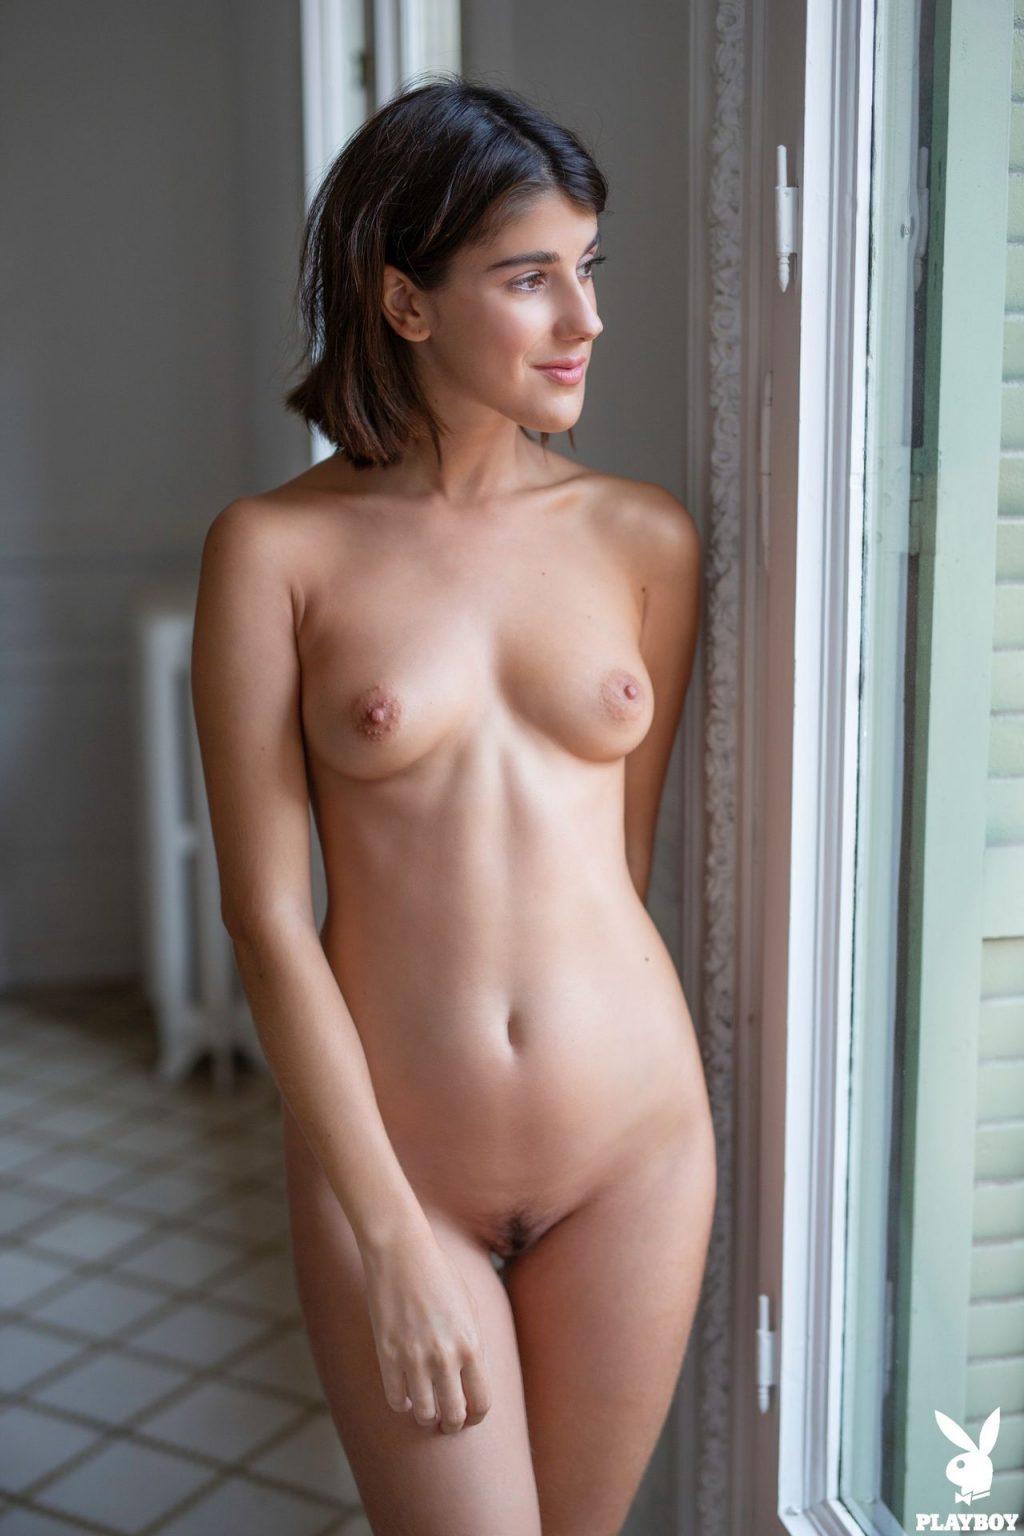 Dove cameron nude